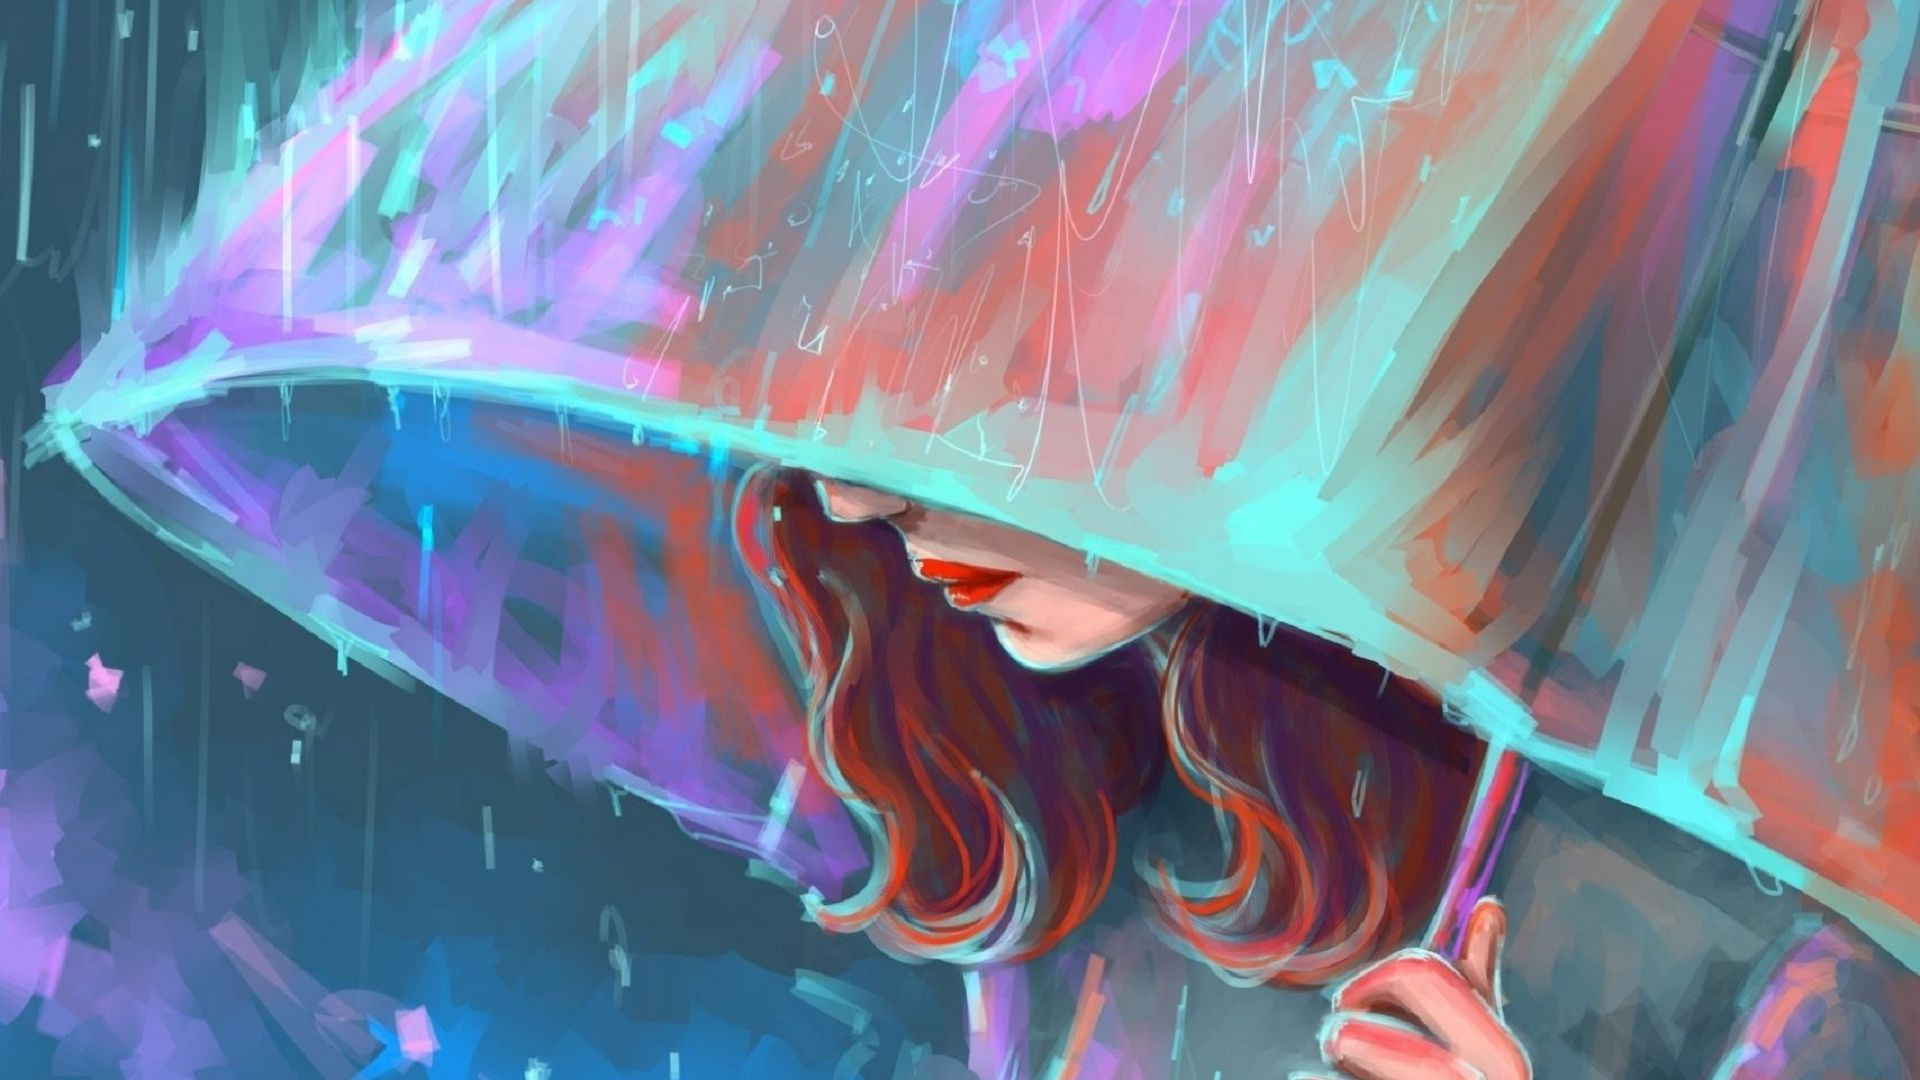 Desktop Wallpaper I Miss You Sad Girl In Rain With ...